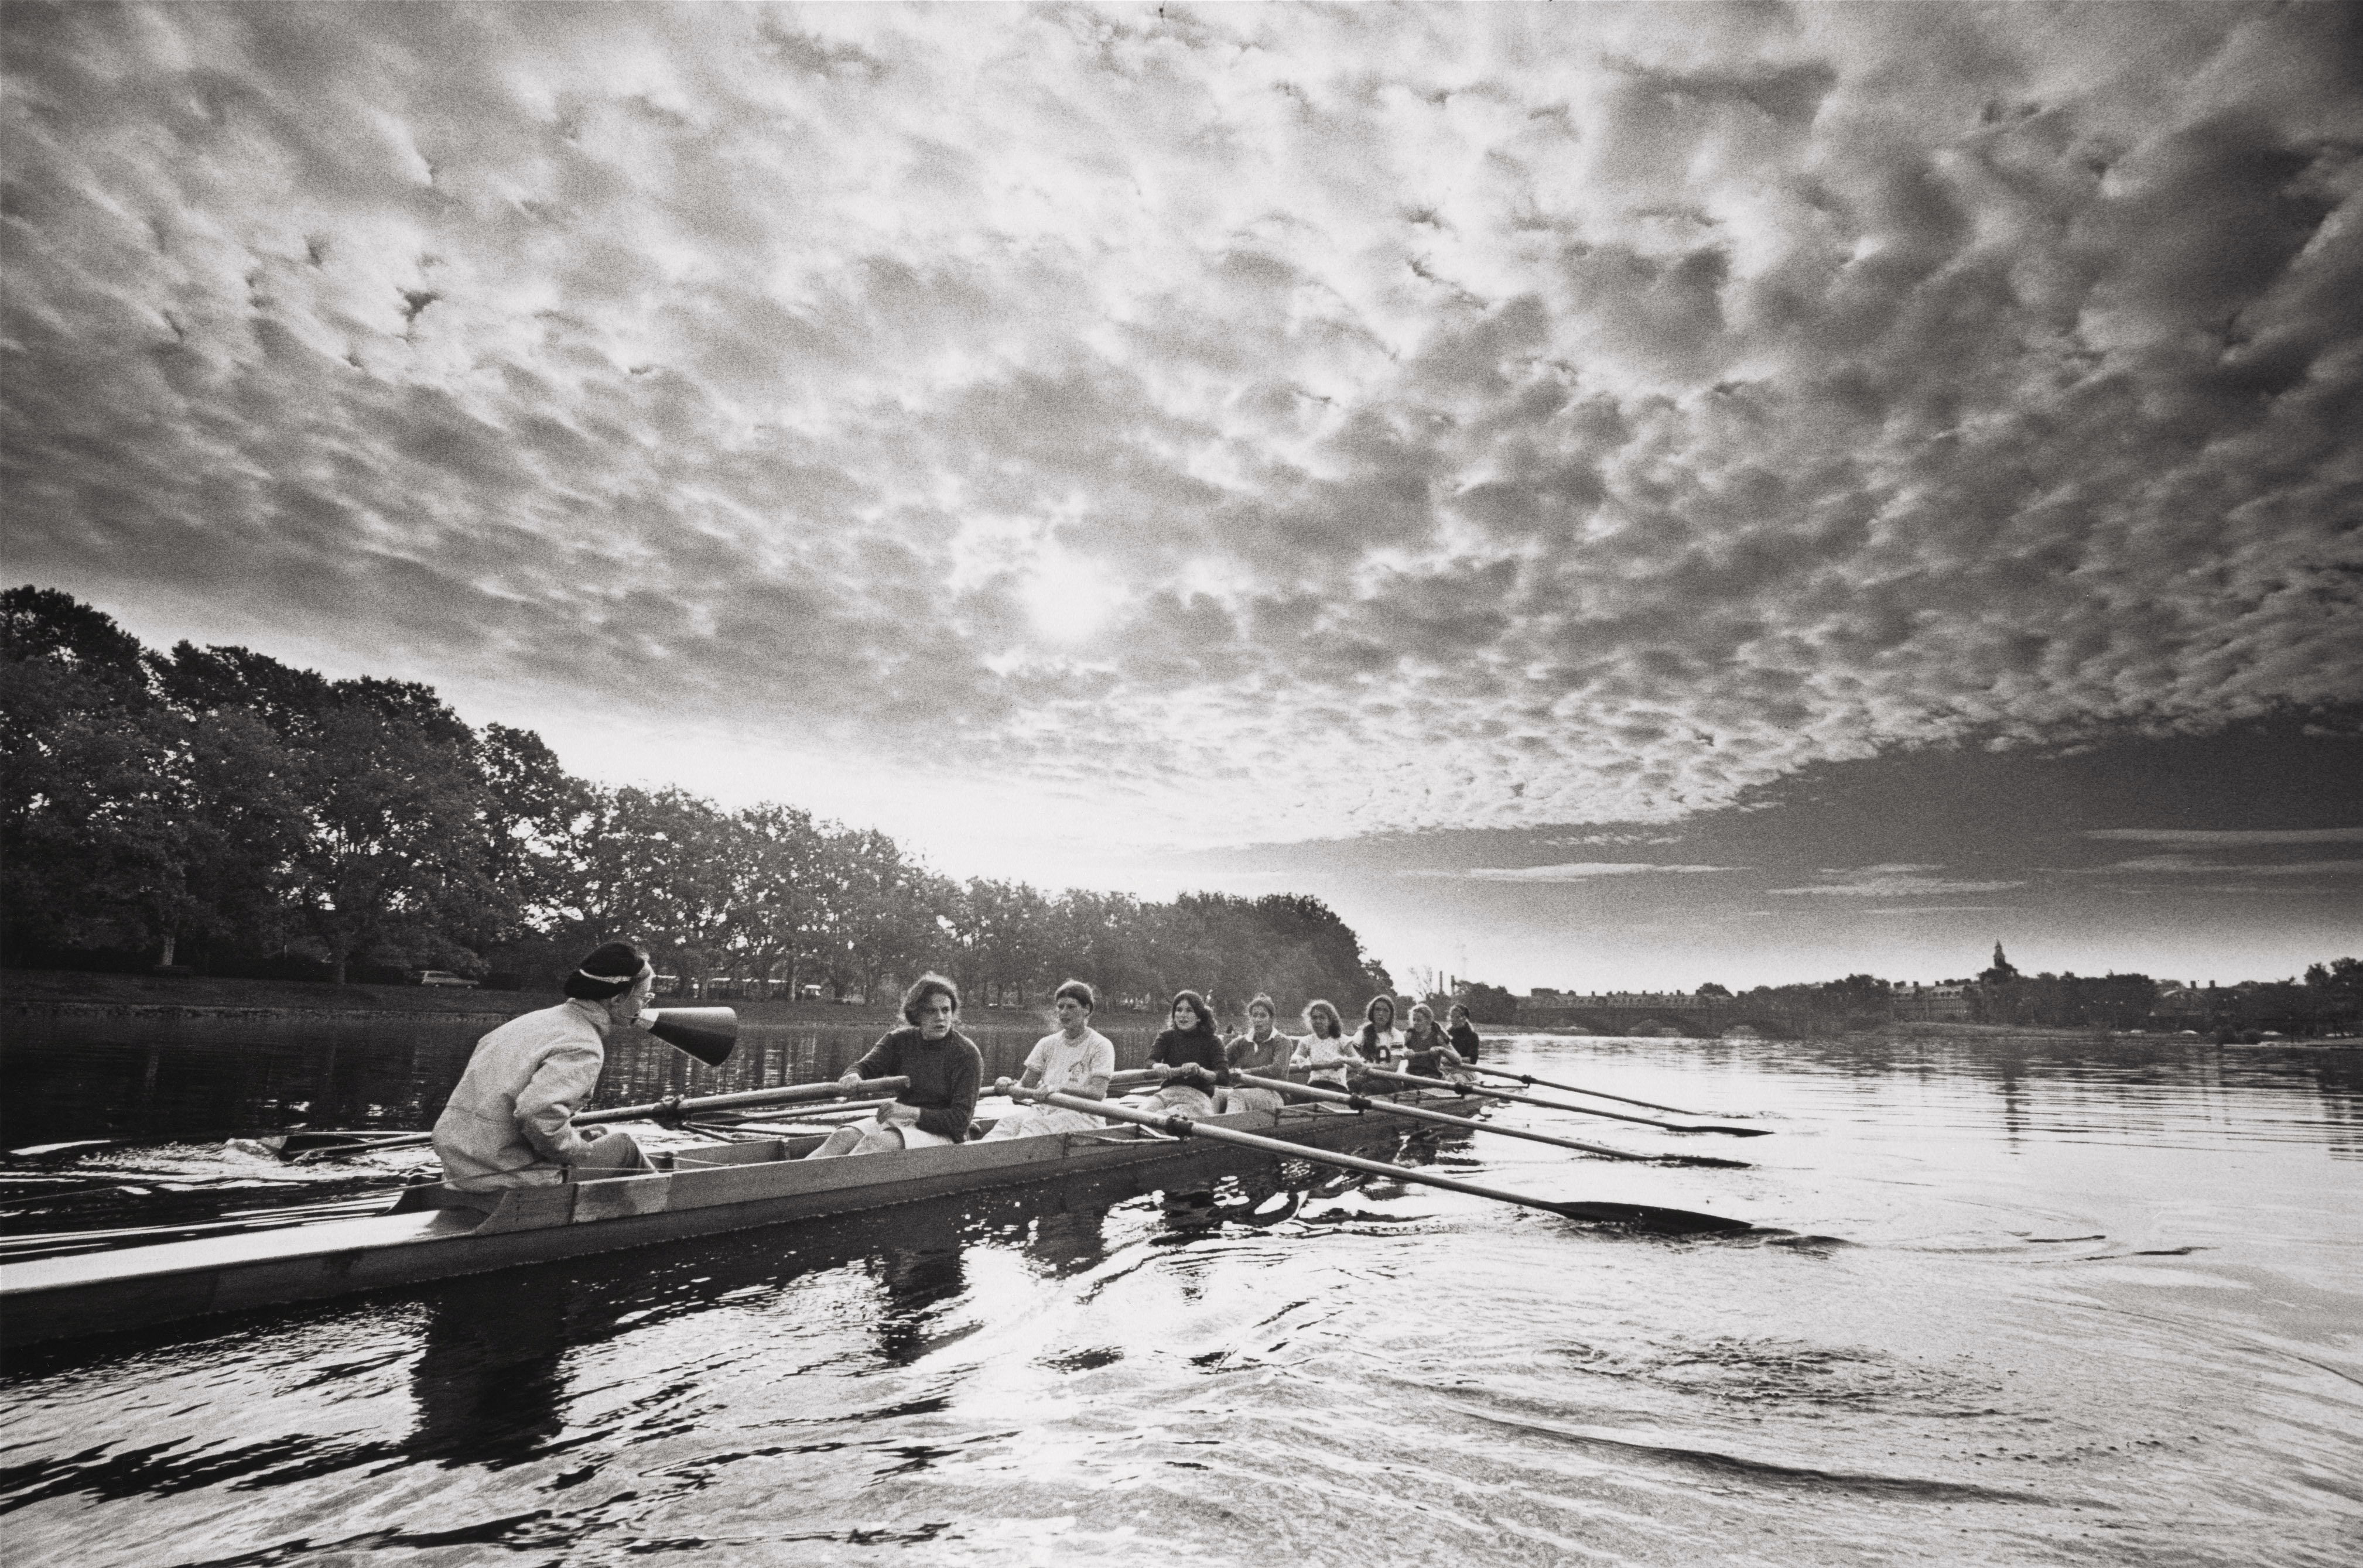 Rowing team in boat